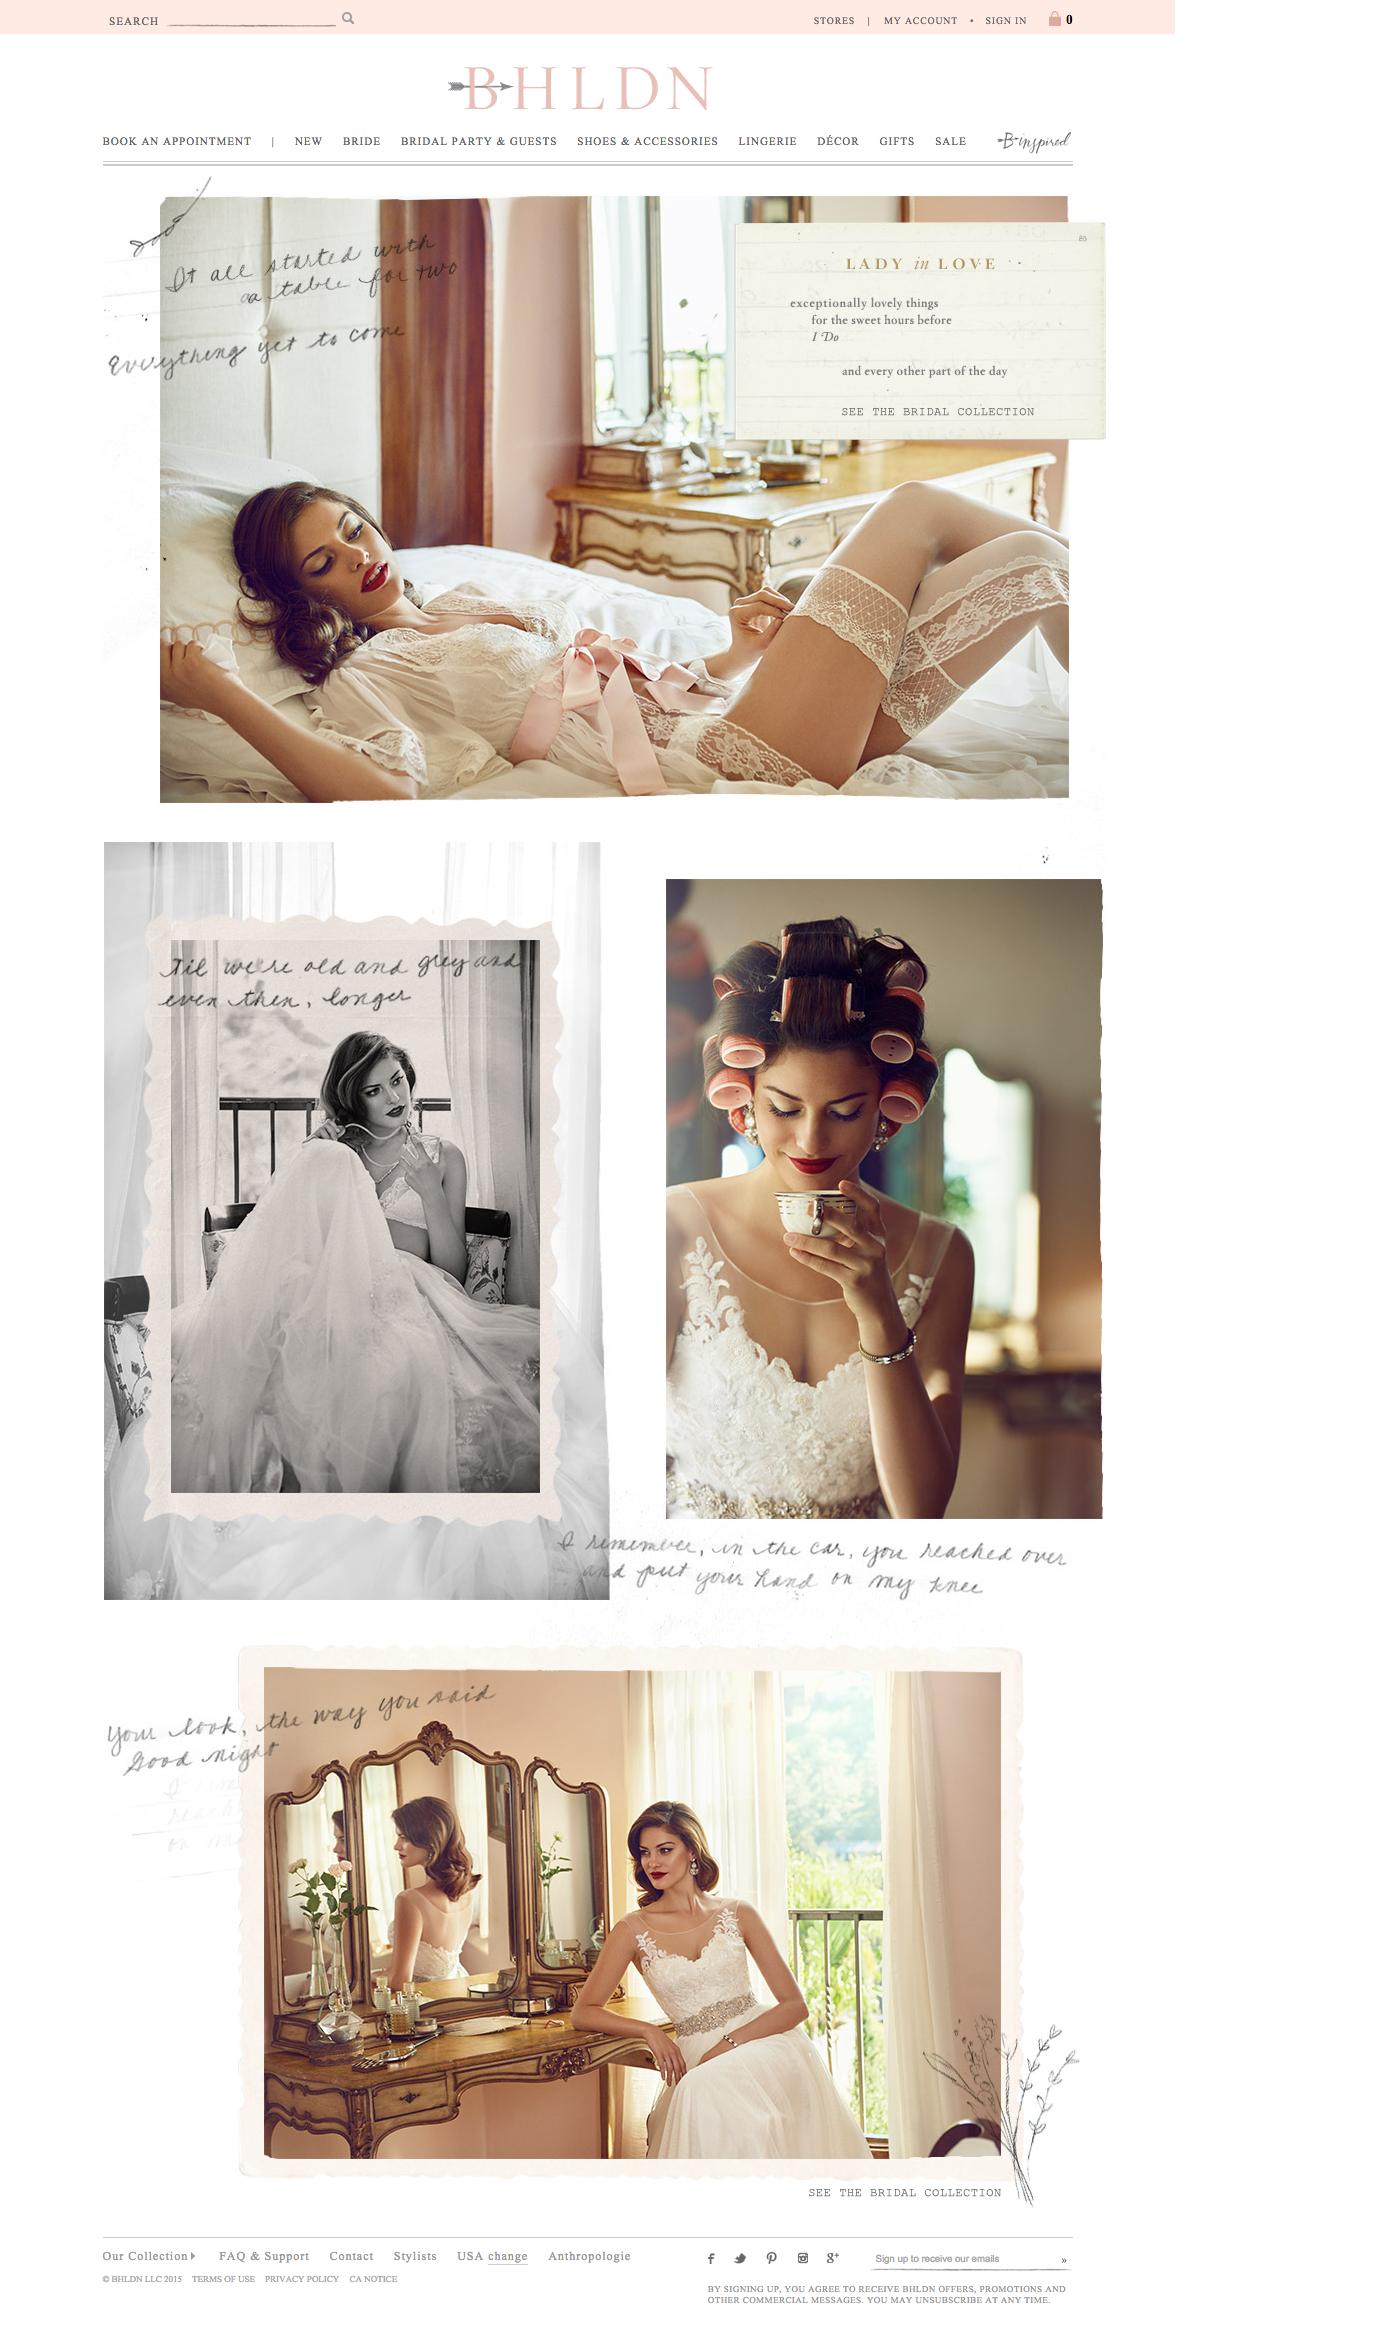 wedding / BHLDN